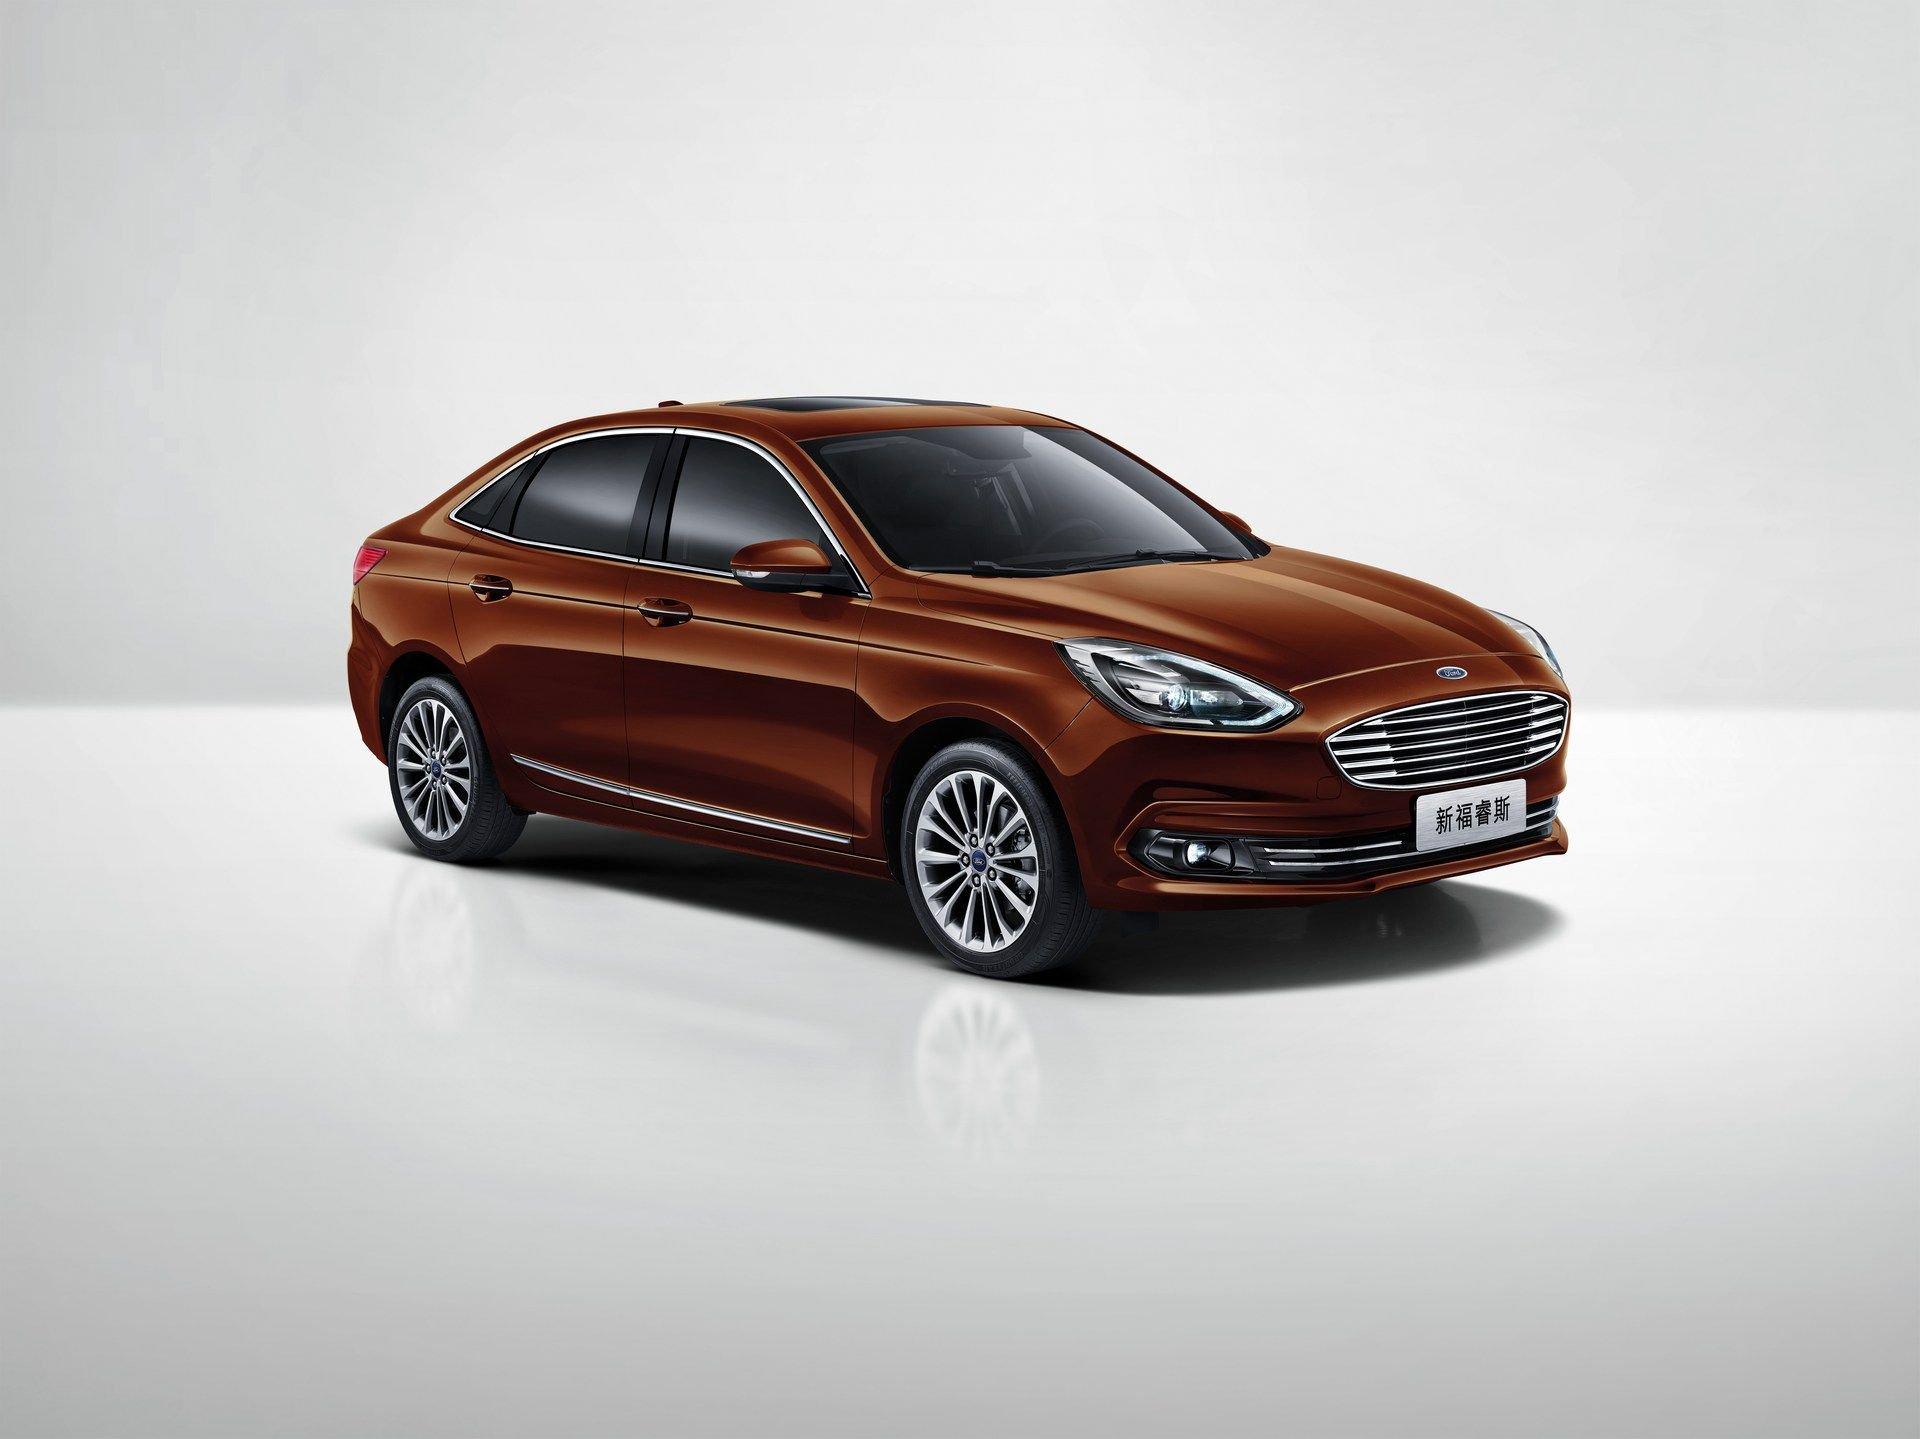 Ford Escort 2019 (3)